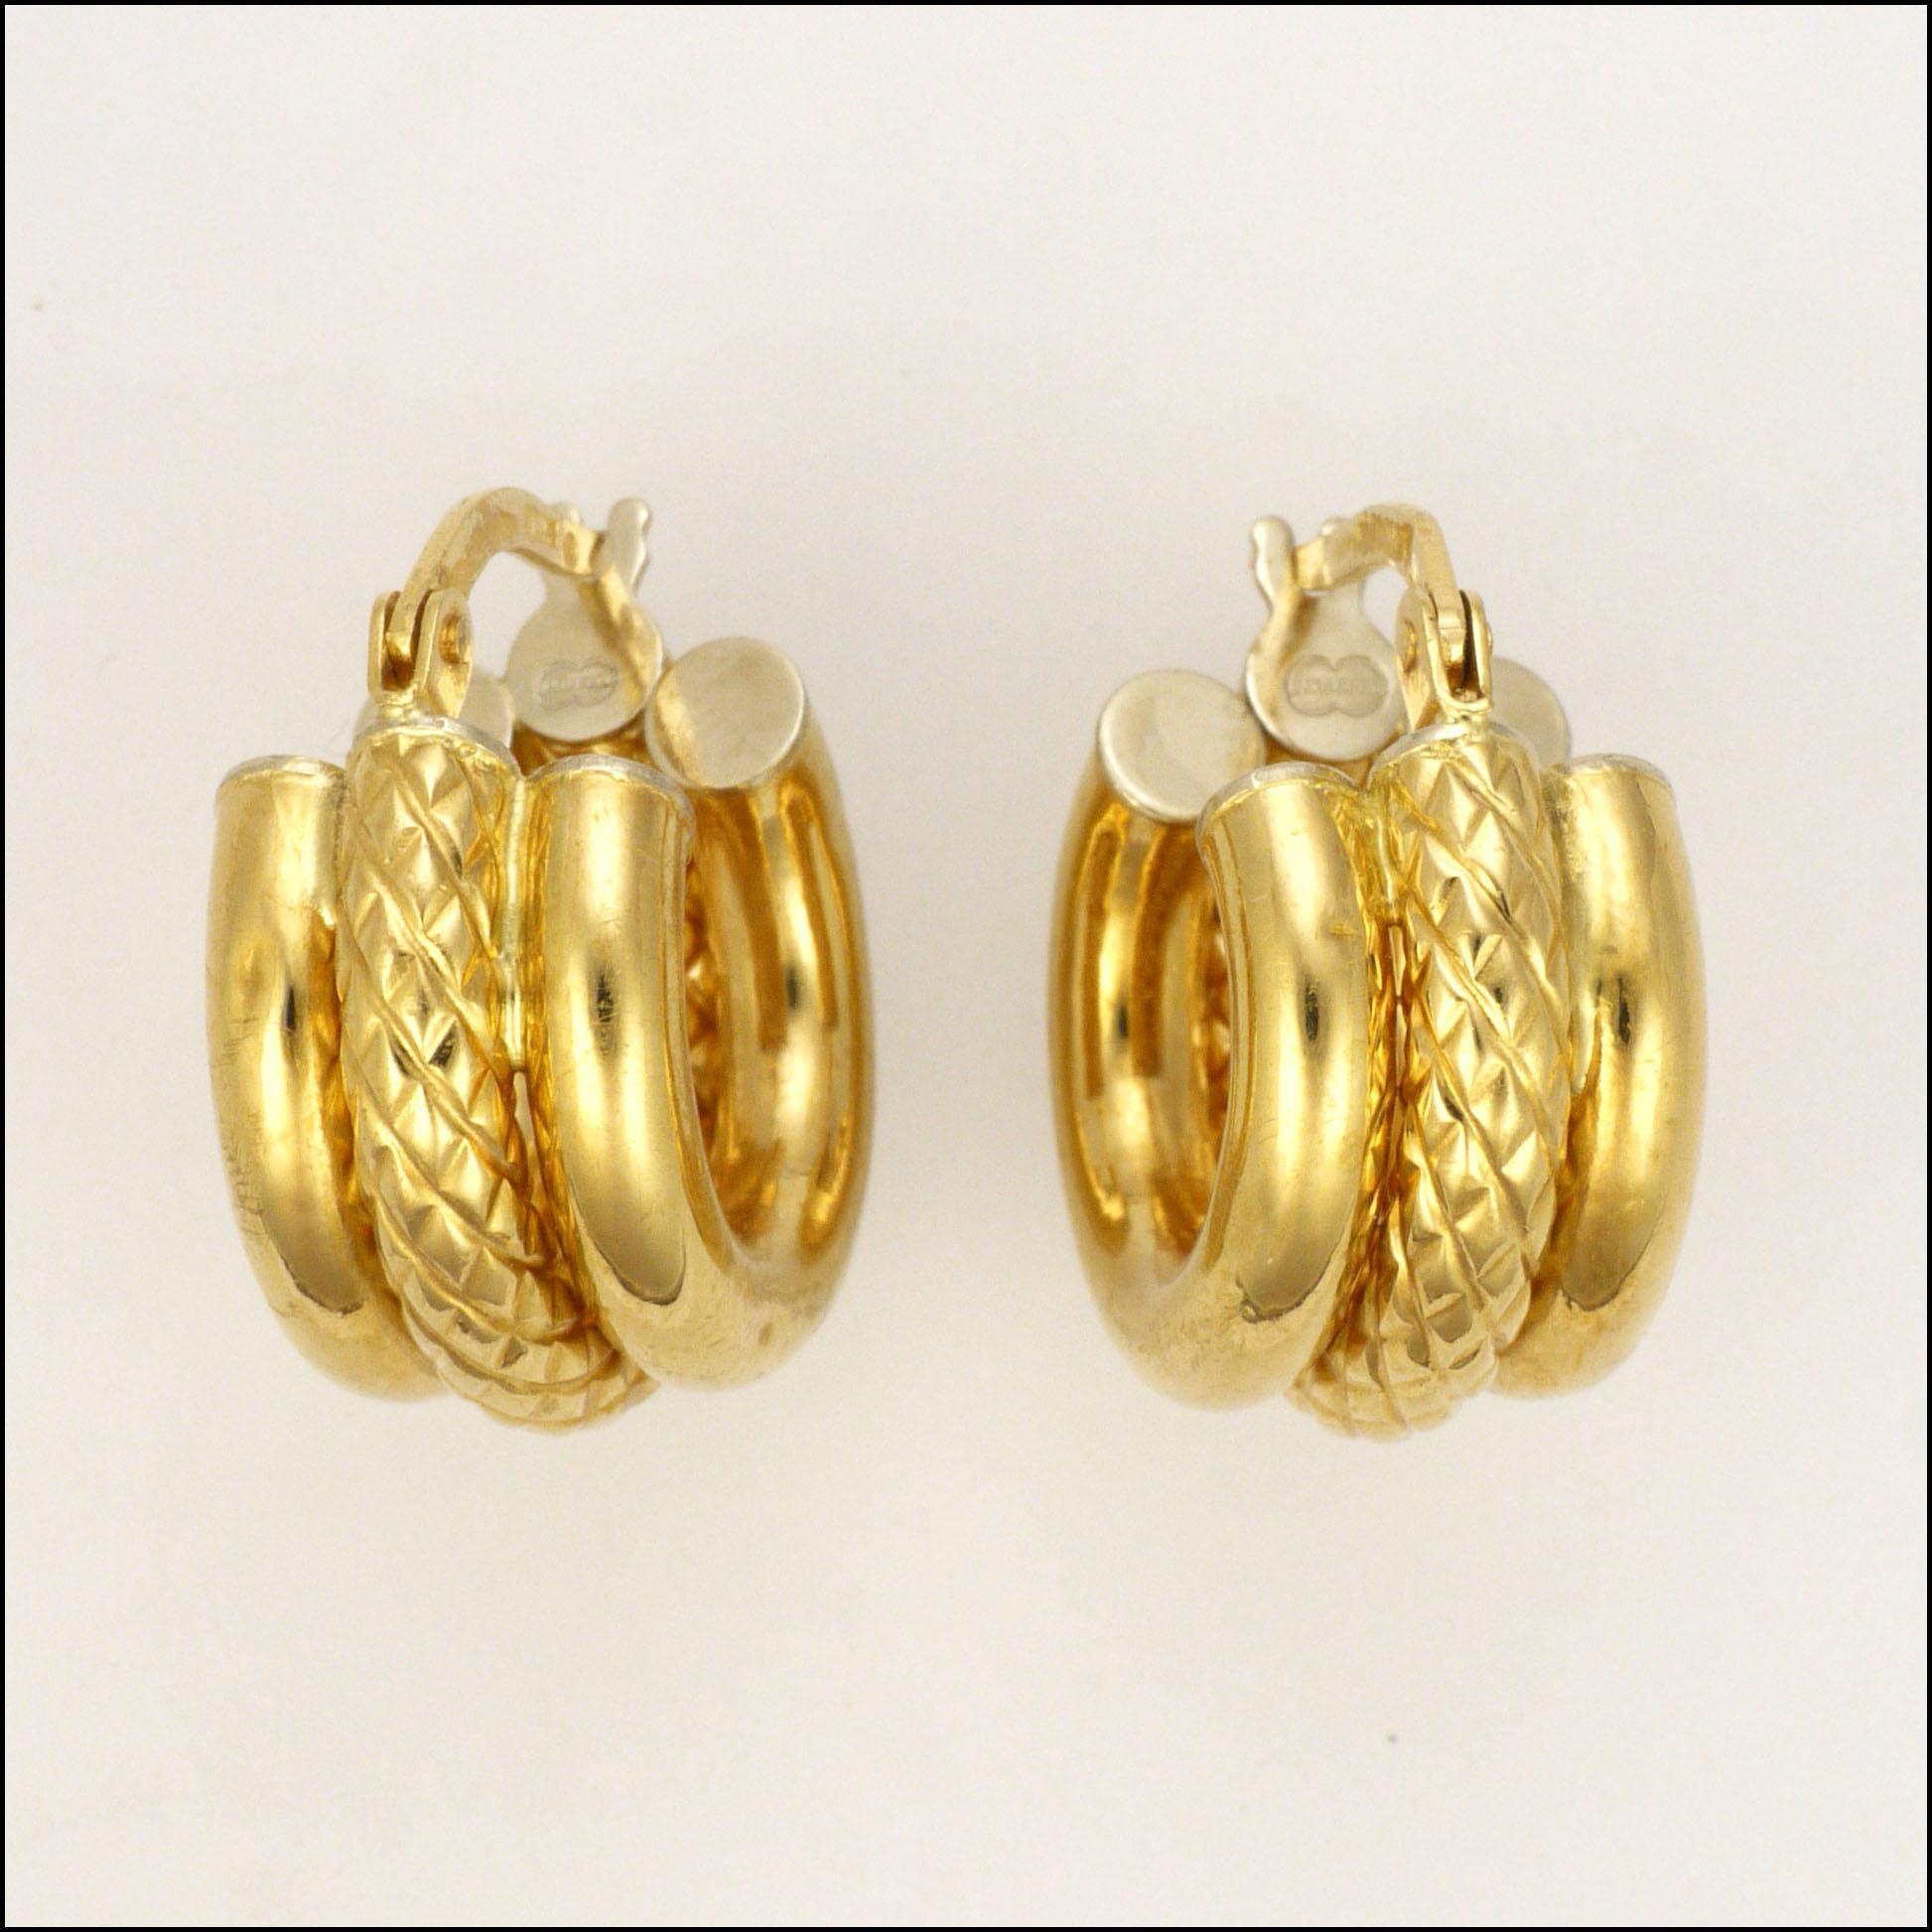 Italian 18 Carat Gold Hoop Earrings